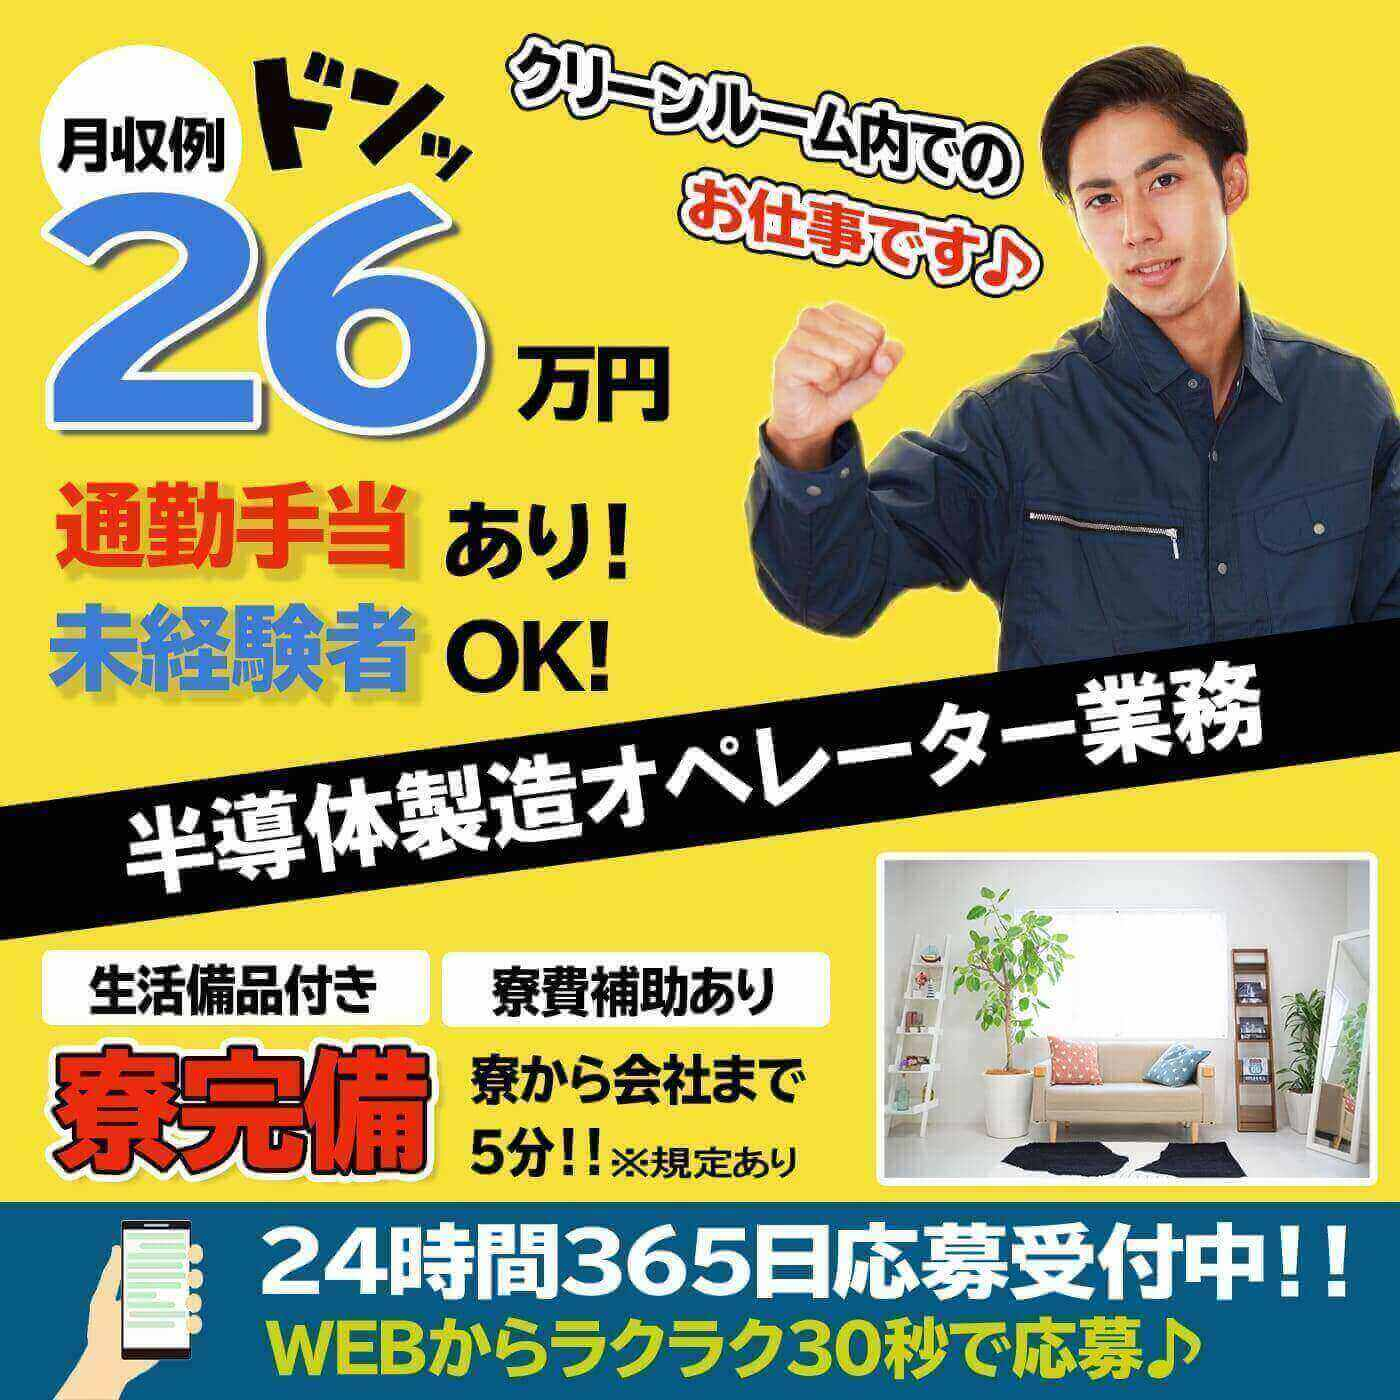 Chitoseshi1 main4